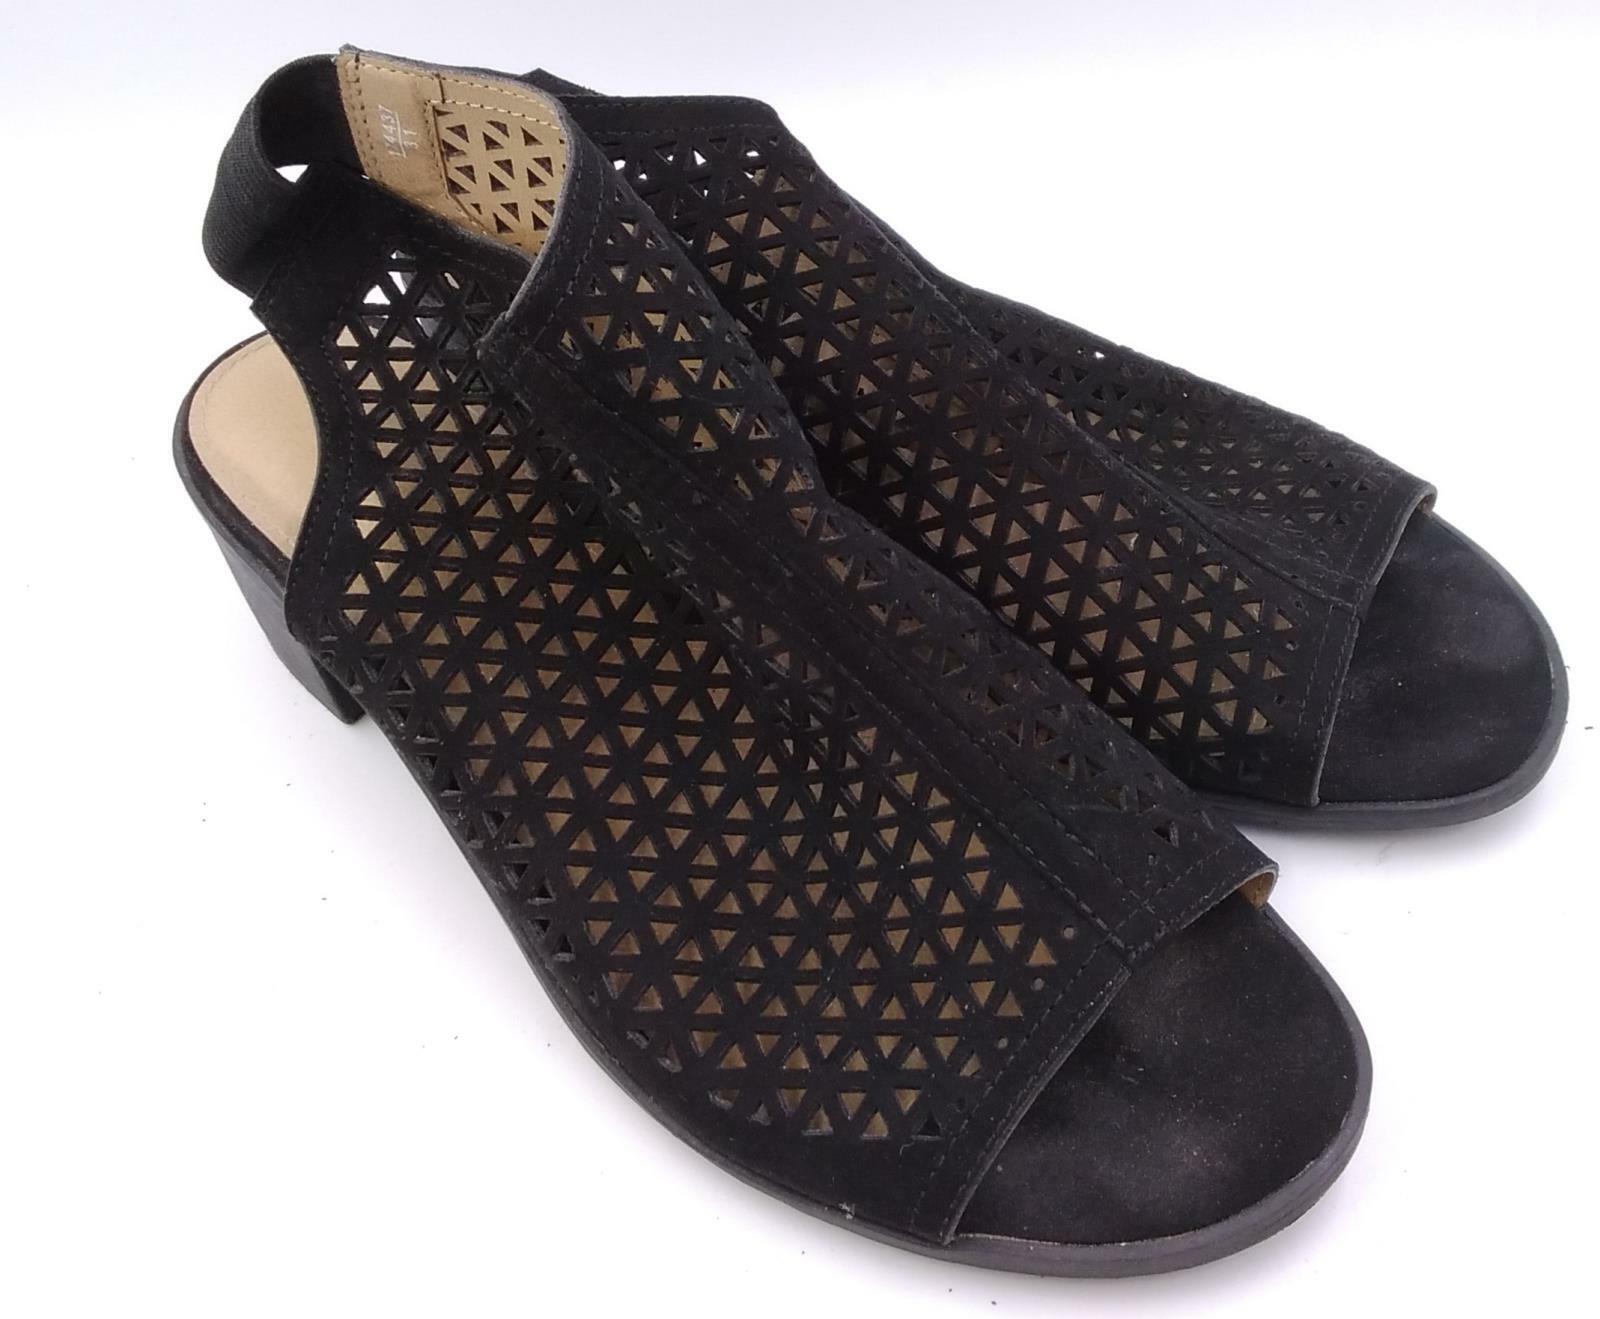 American Eagle Womens Black Vista Hooded Block Heel Slingback Sandal Size 8W